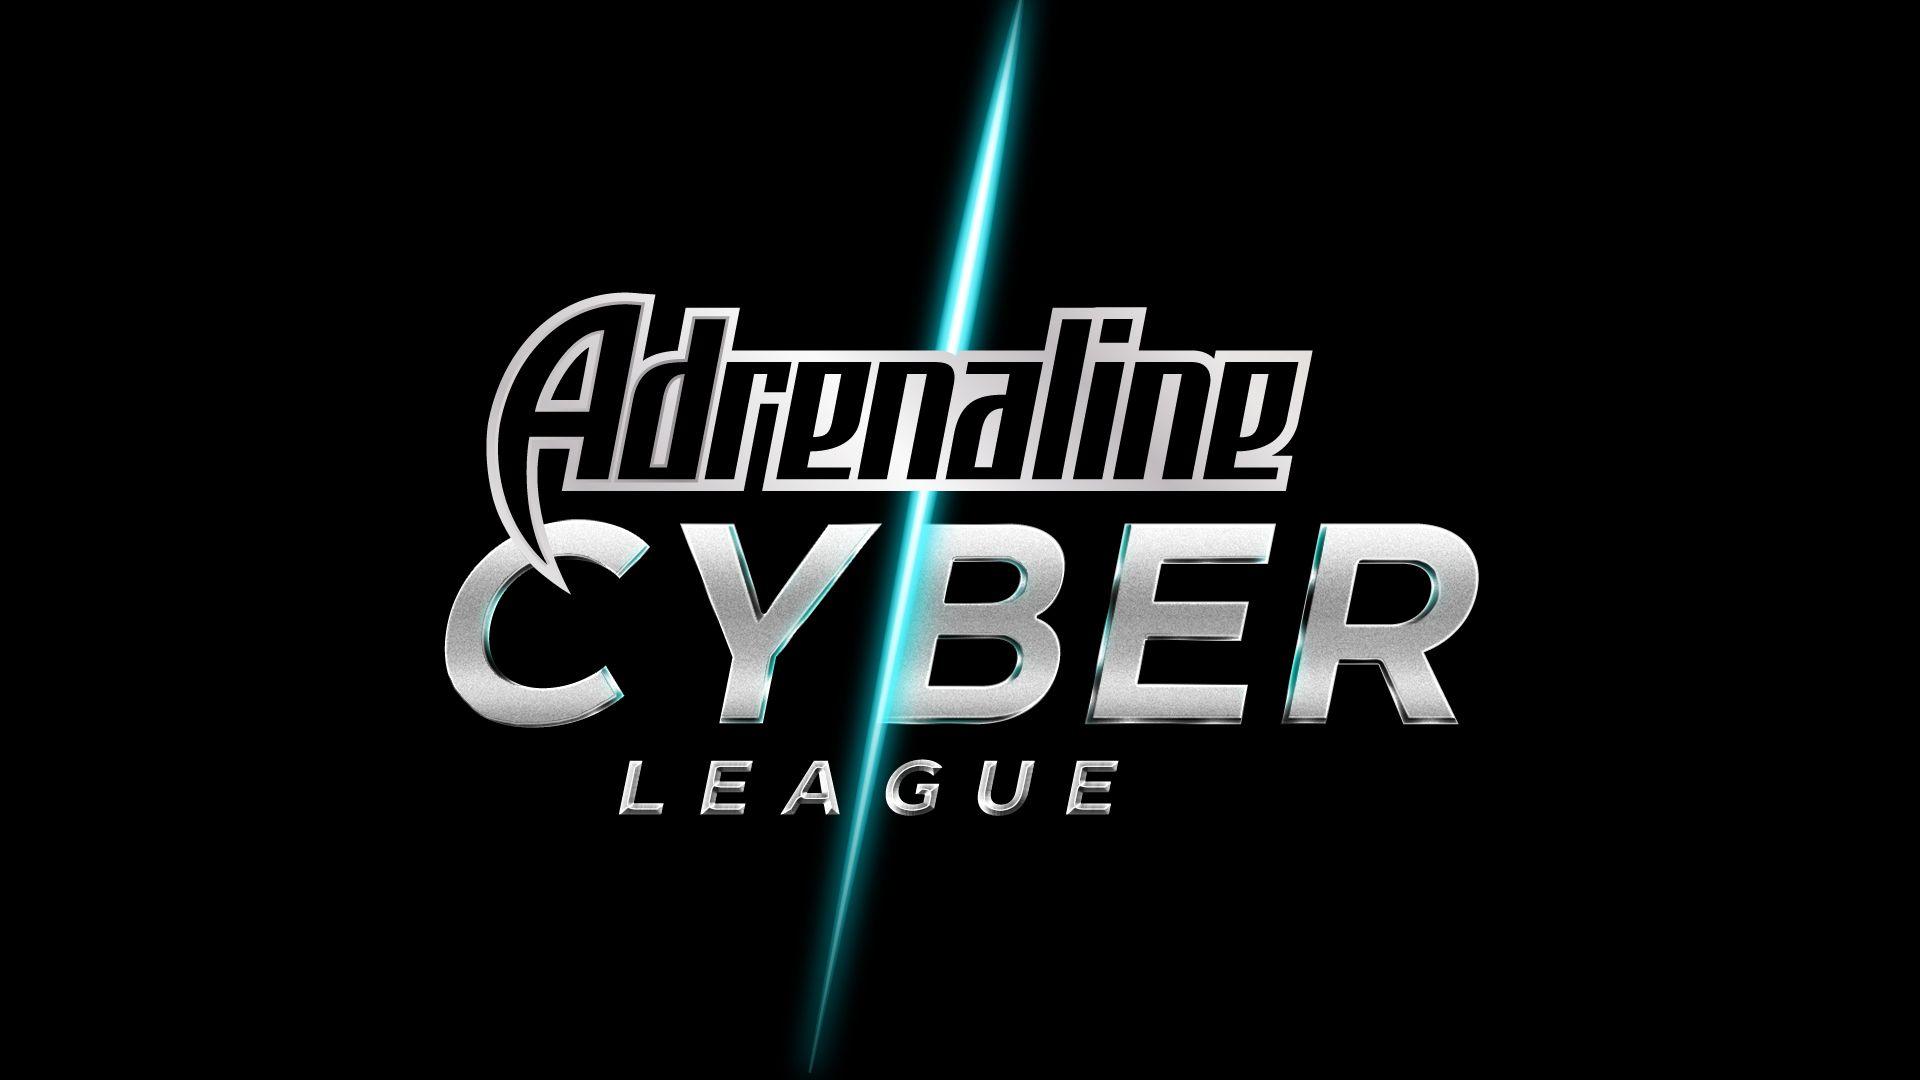 Adrenaline Cyber League 2017 Preview #games #globaloffensive #CSGO #counterstrike #hltv #CS #steam #Valve #djswat #CS16